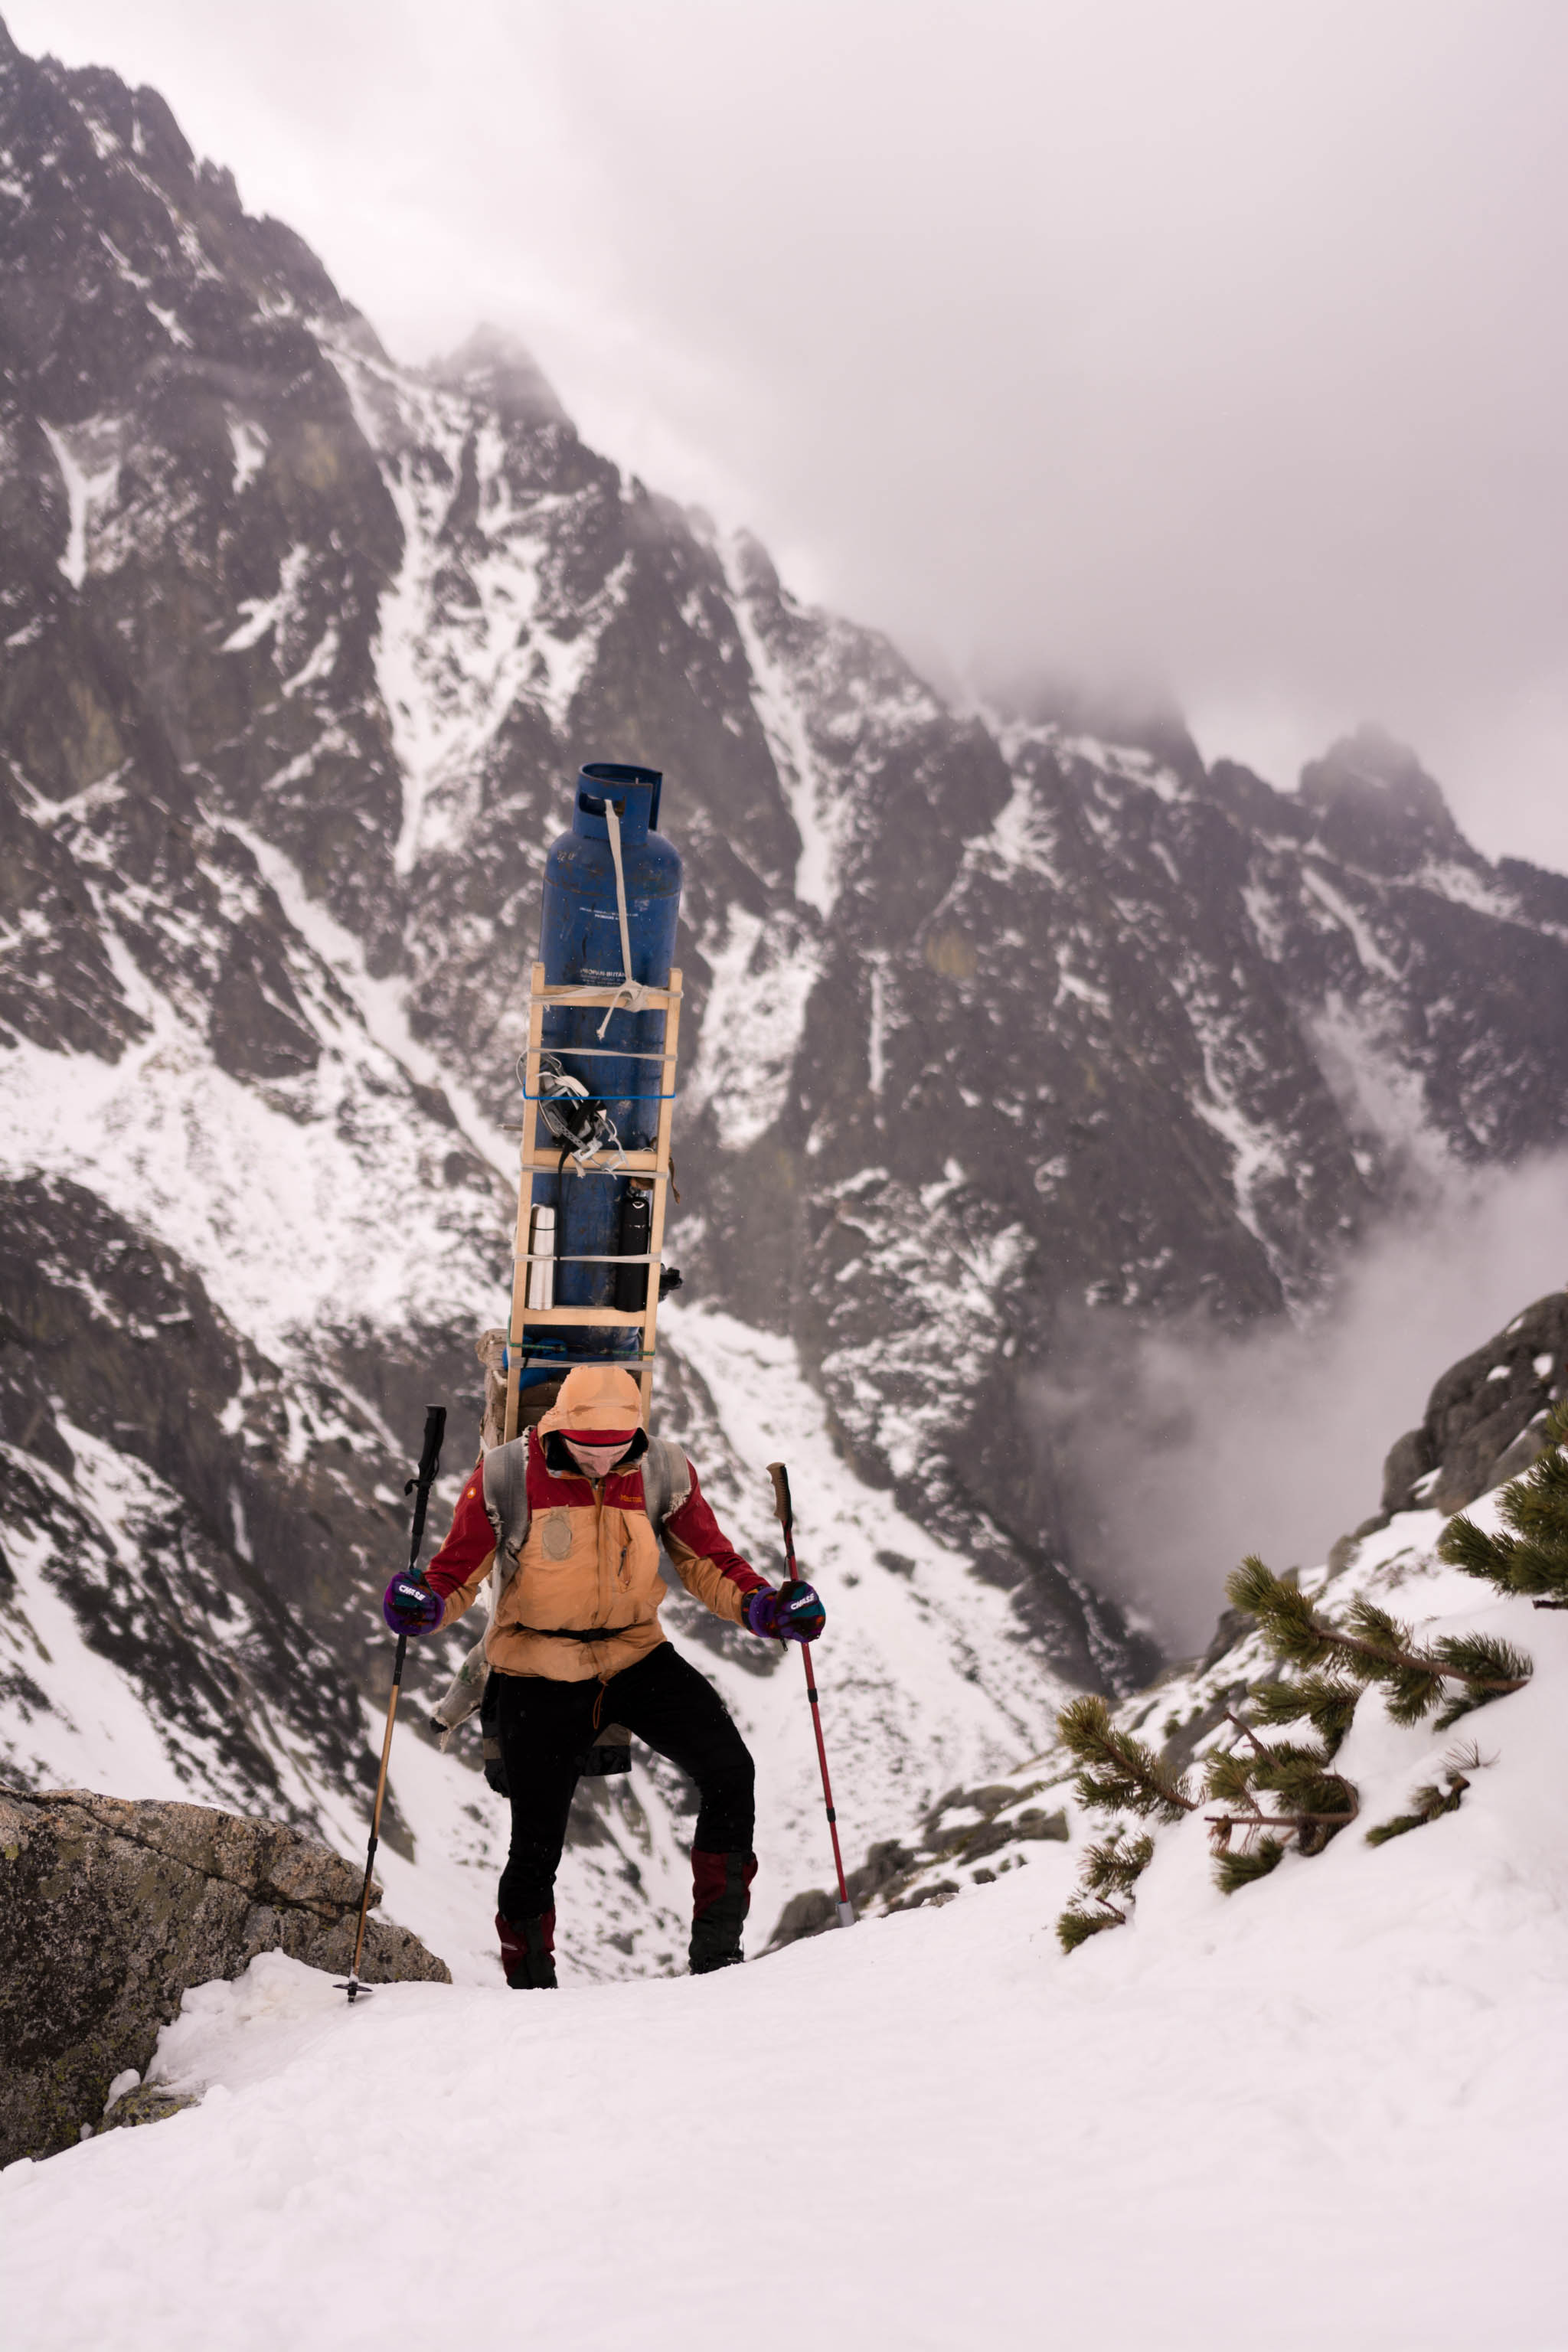 Hohe Tatra Sherpa Wandern Portrait Števo Bačkor Lastenträger Konzentration Kopfarbeit Berghütte